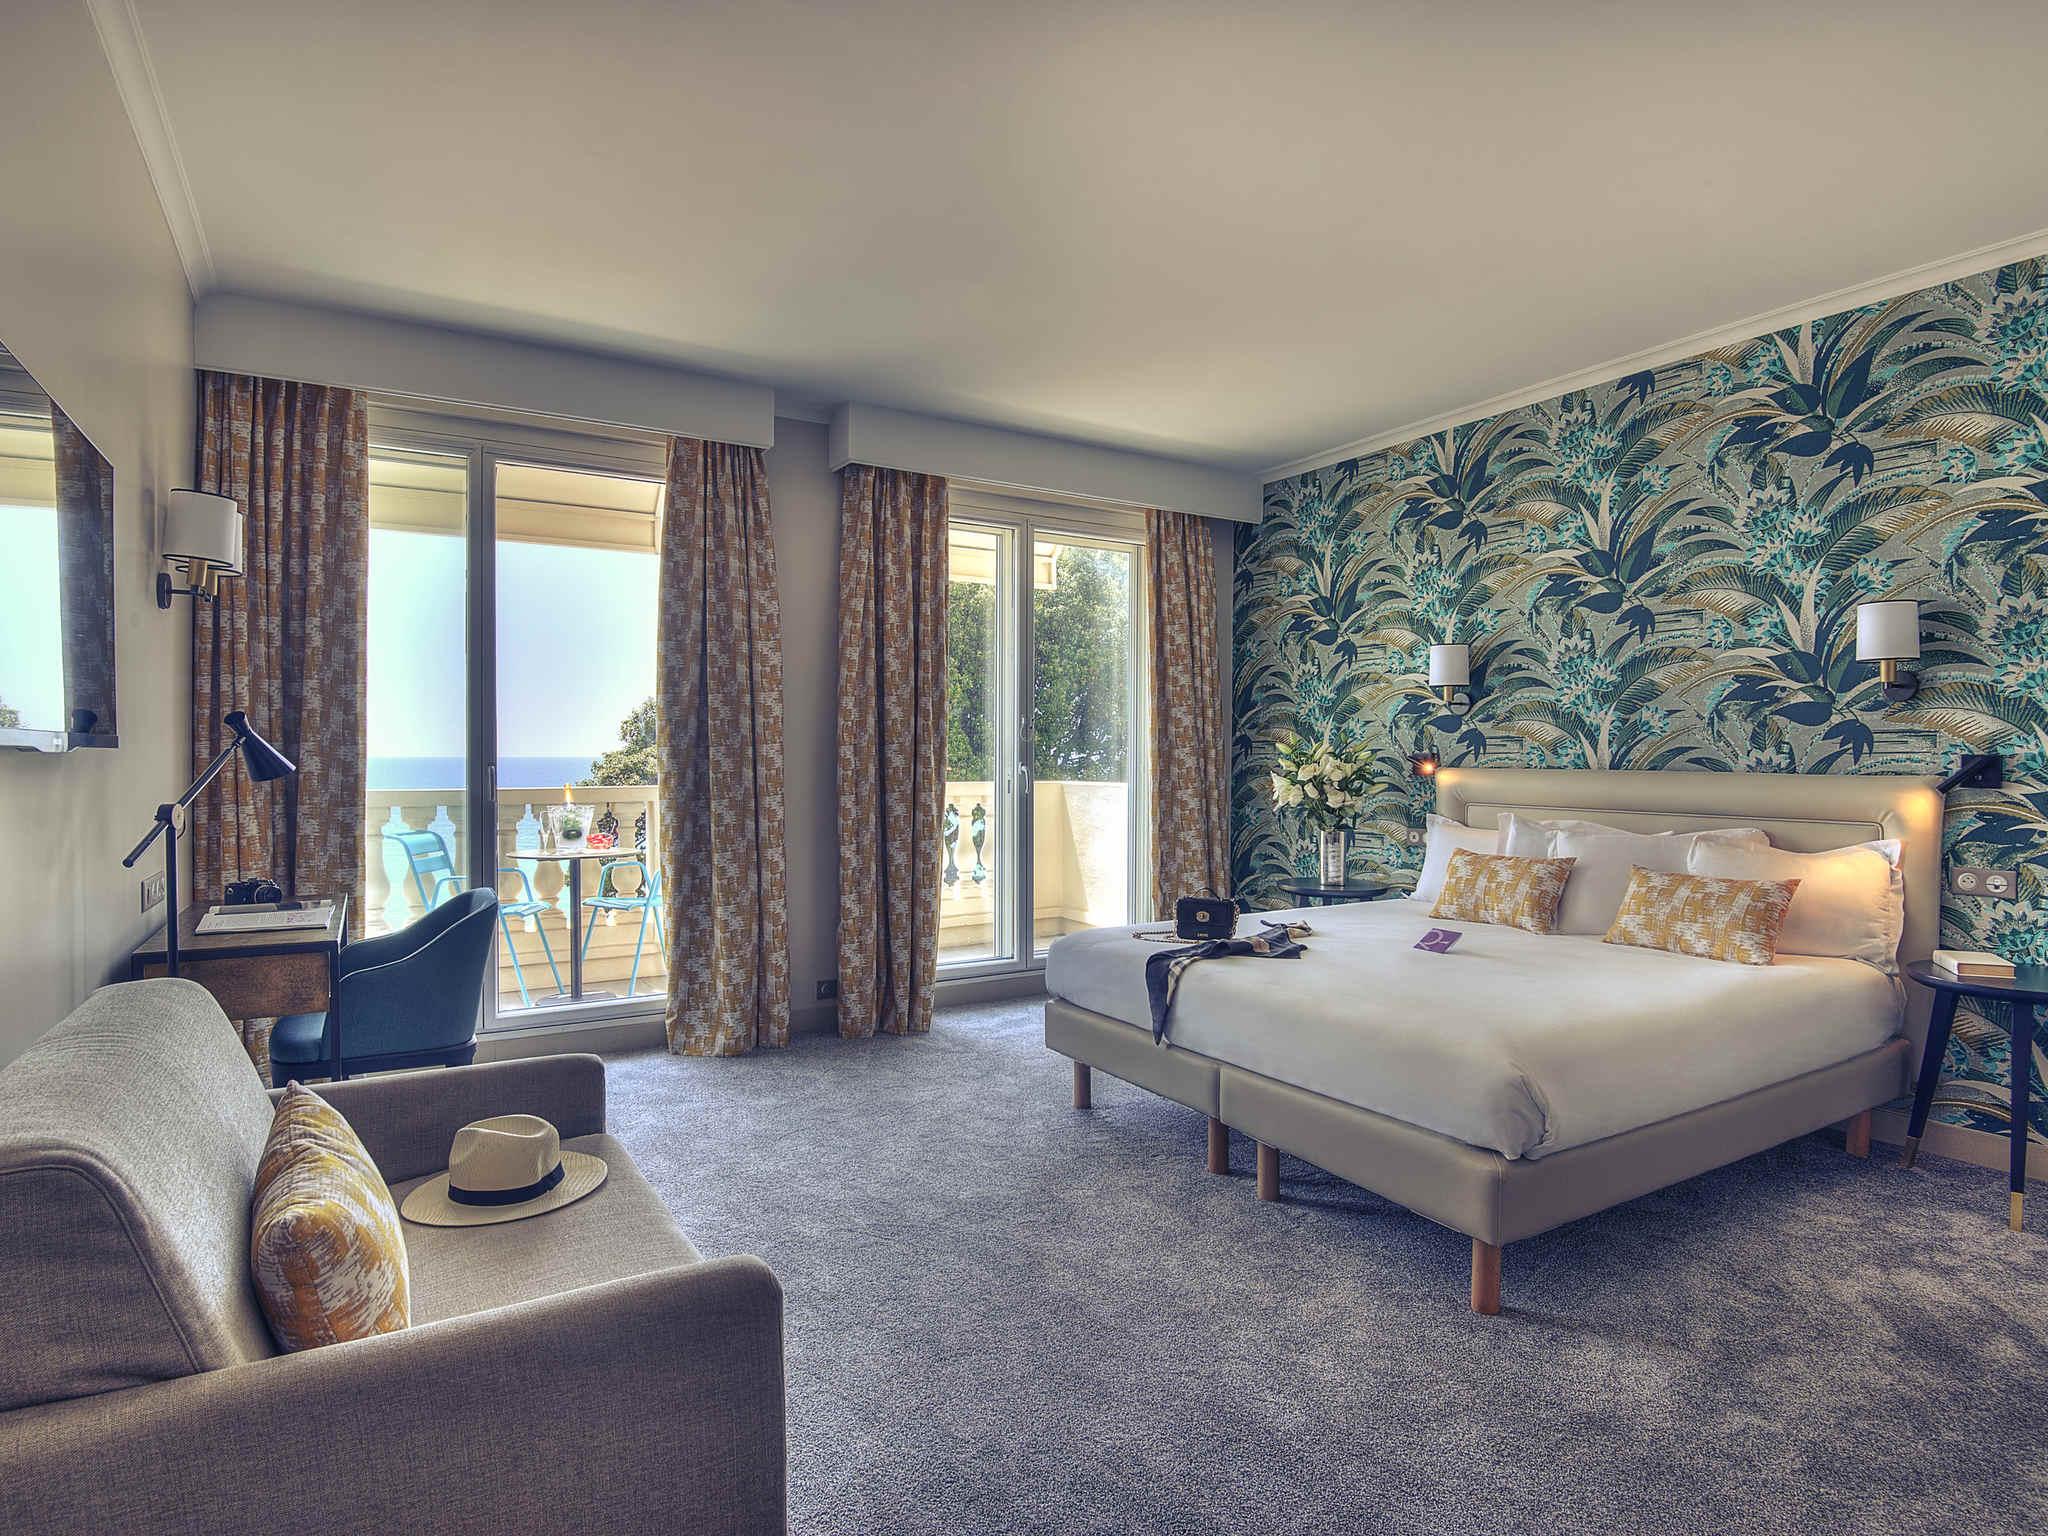 Hotel – Albergo Mercure Nice Marche aux Fleurs